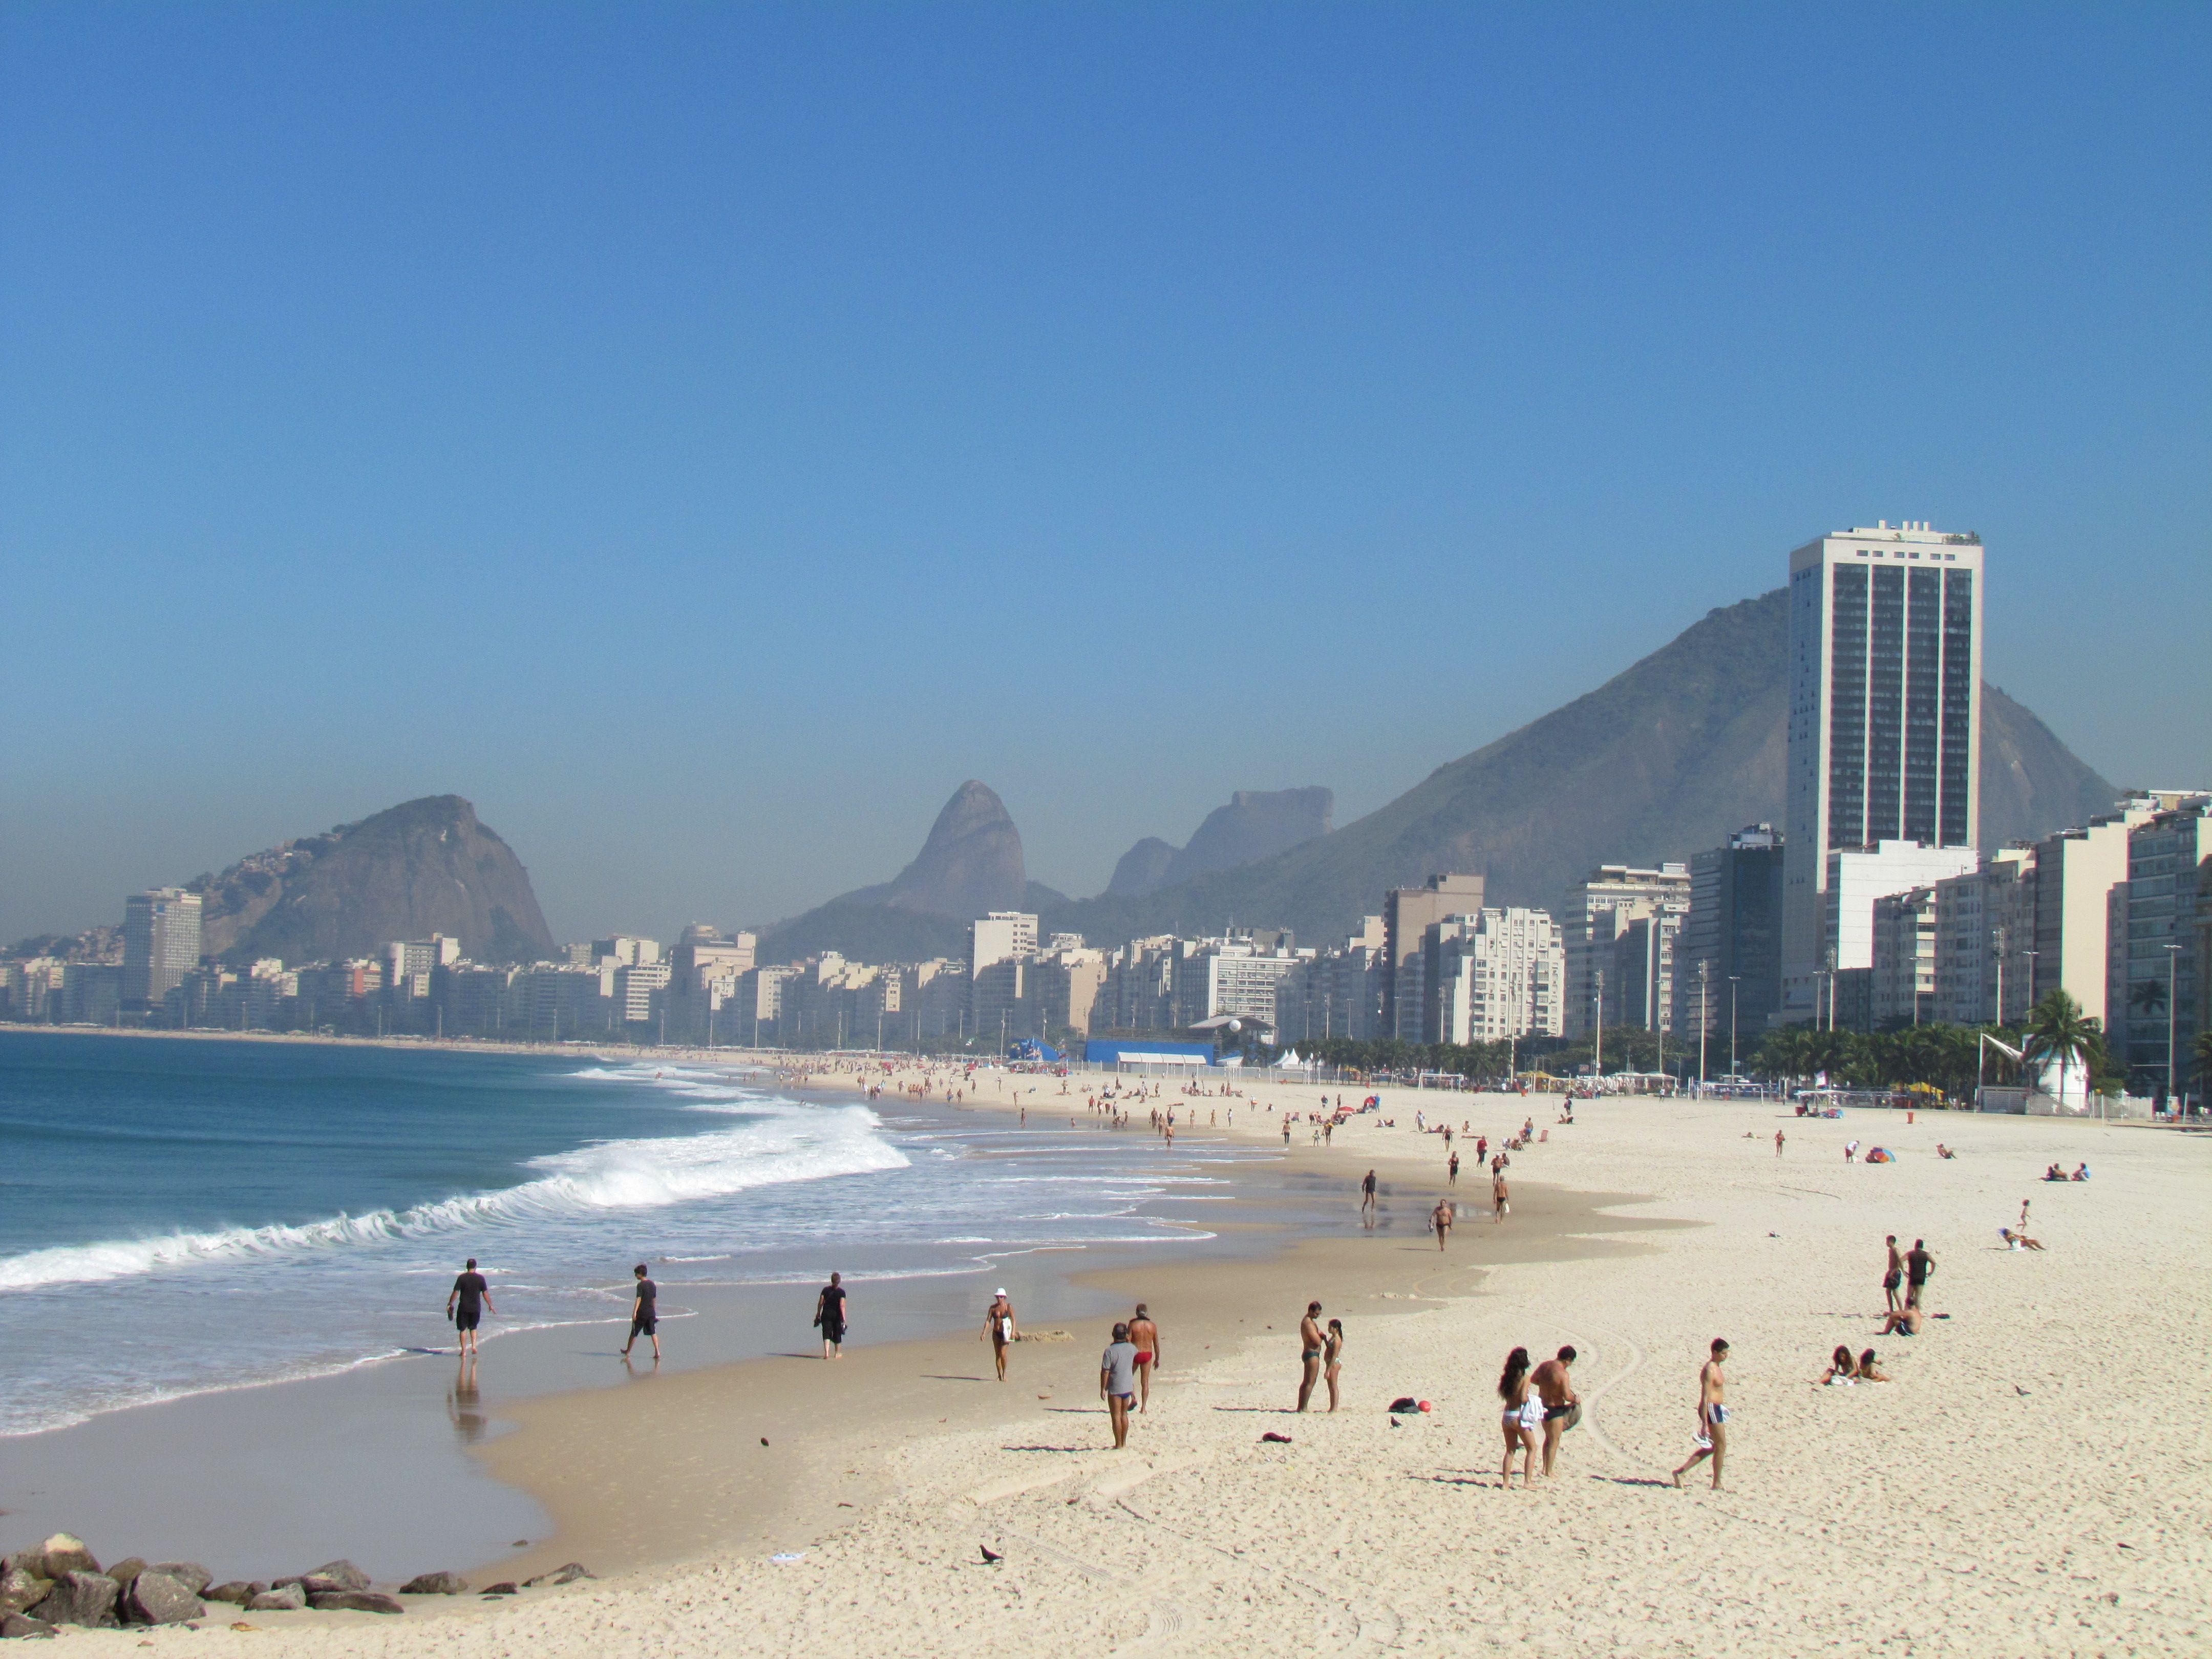 Copacabana, Rio de Janeiro, Brazil